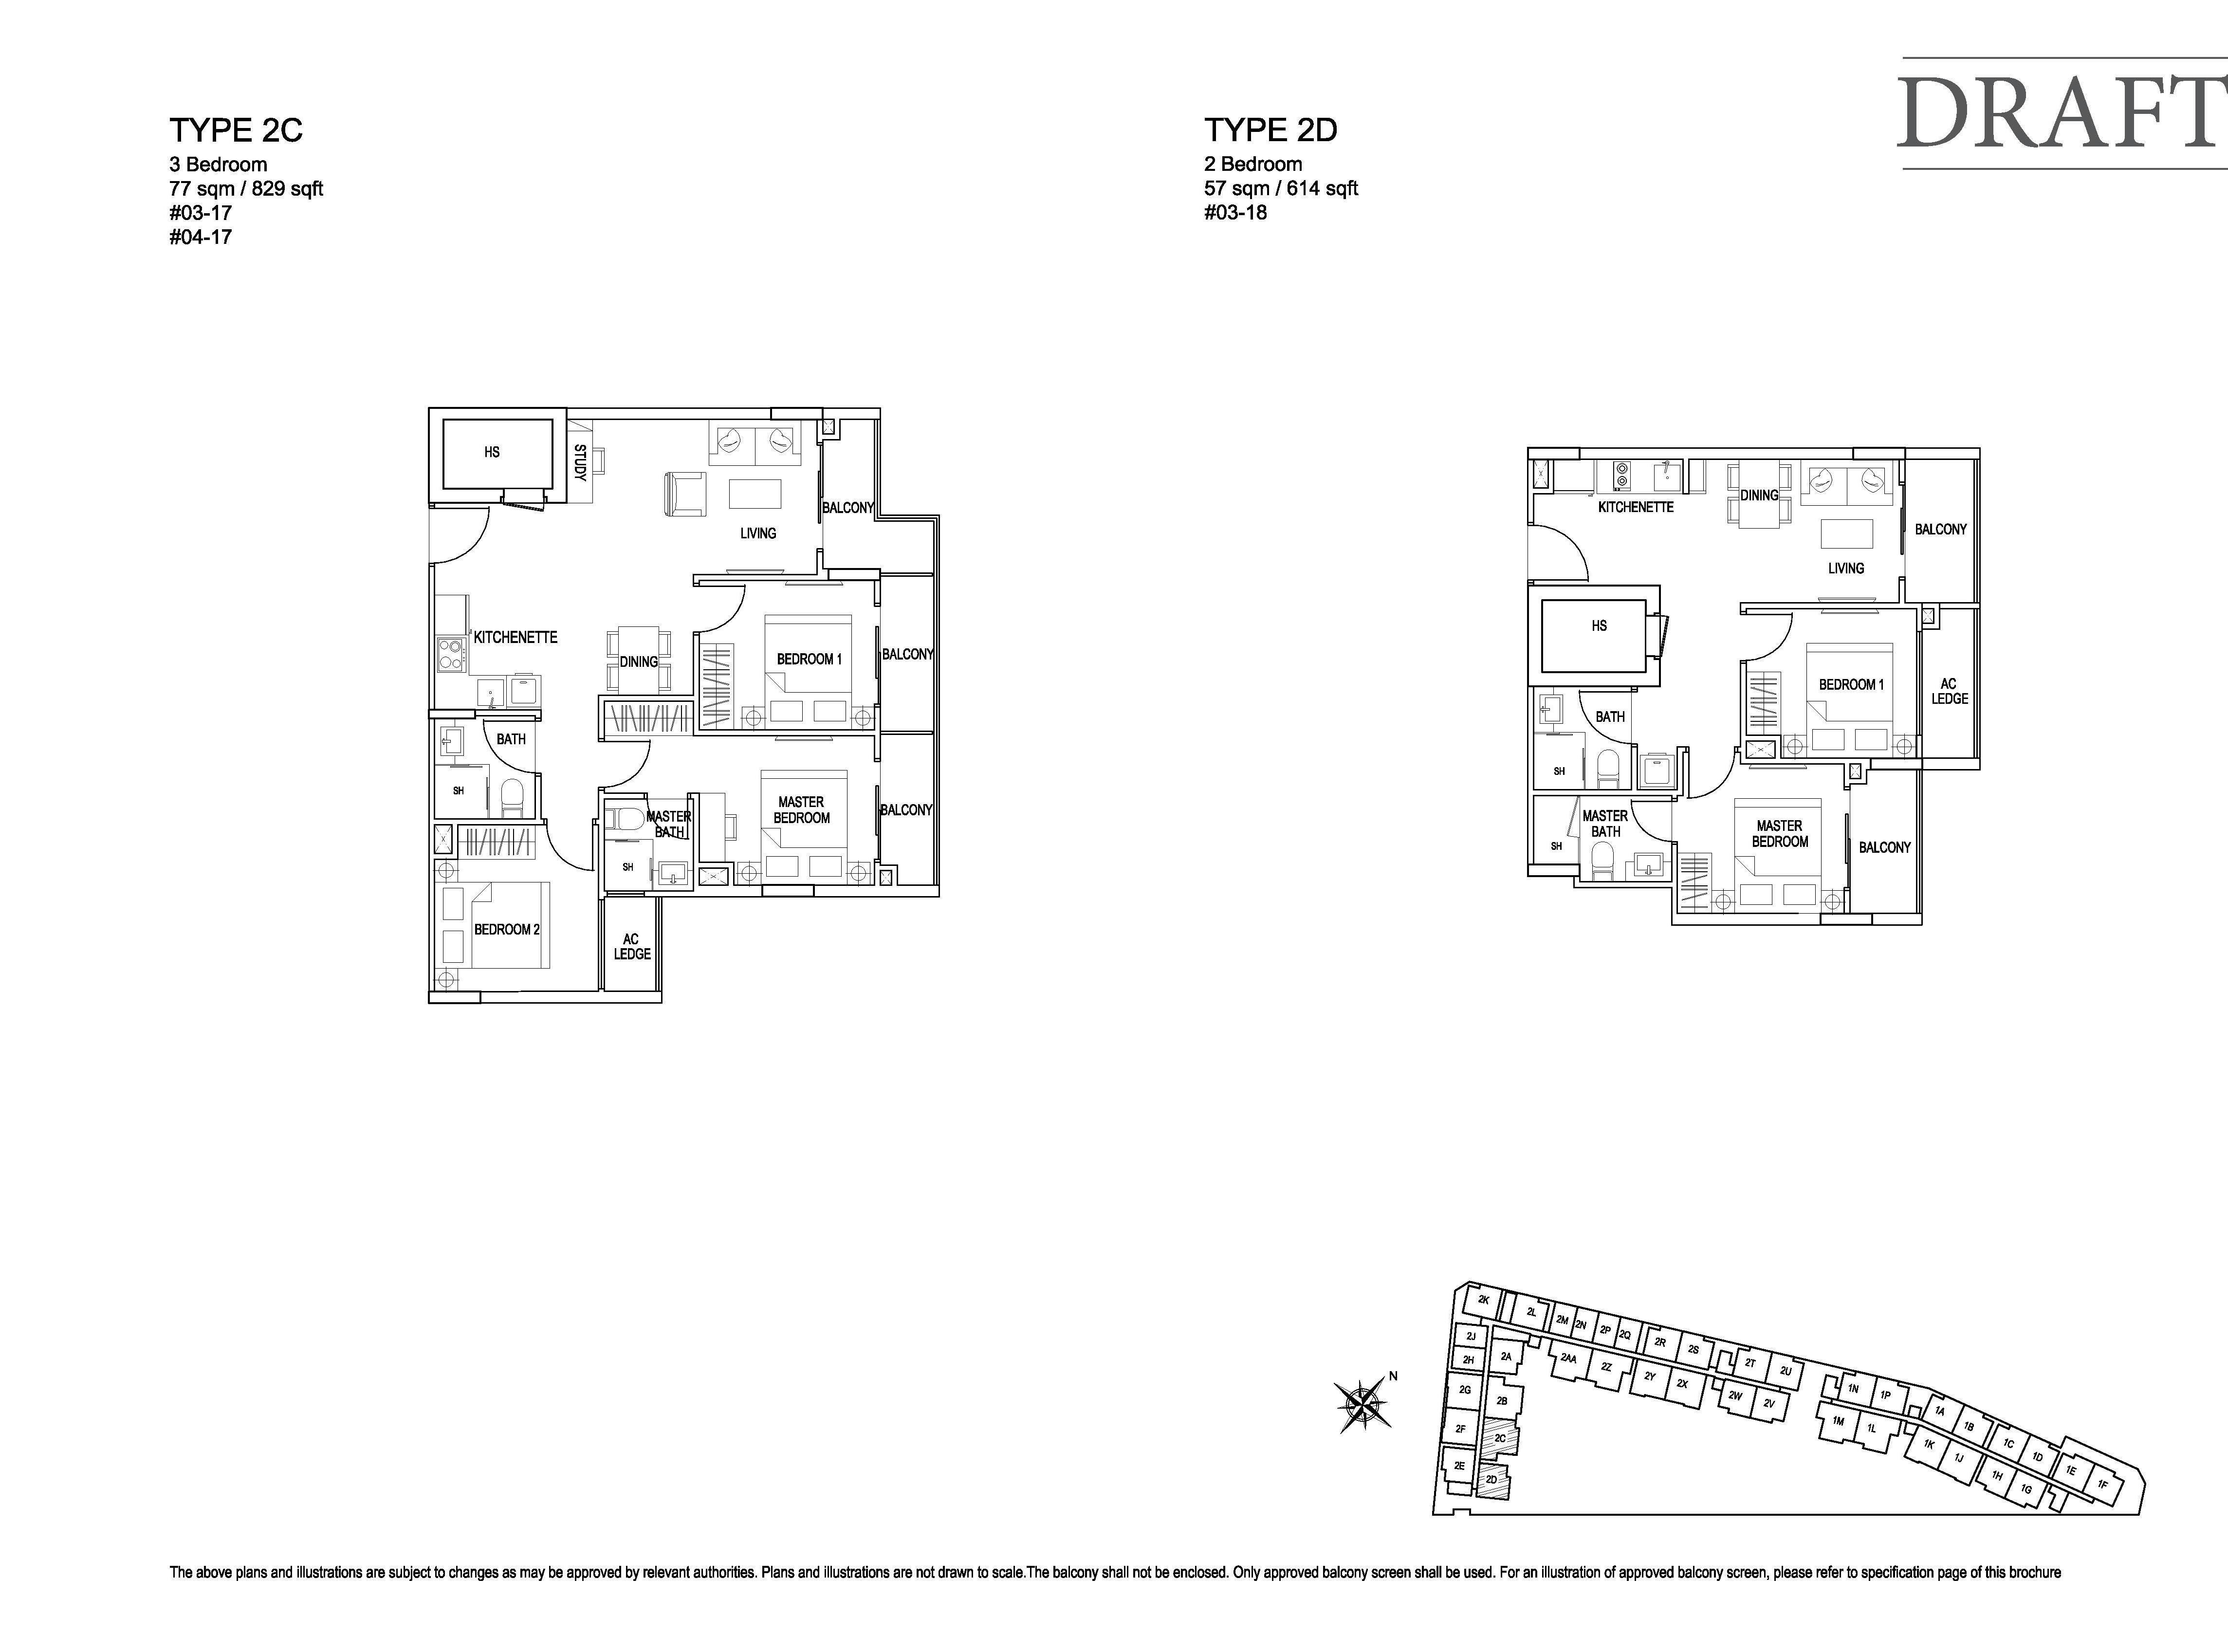 Kensington Square 3 Bedroom Floor Plans Type Type 2C